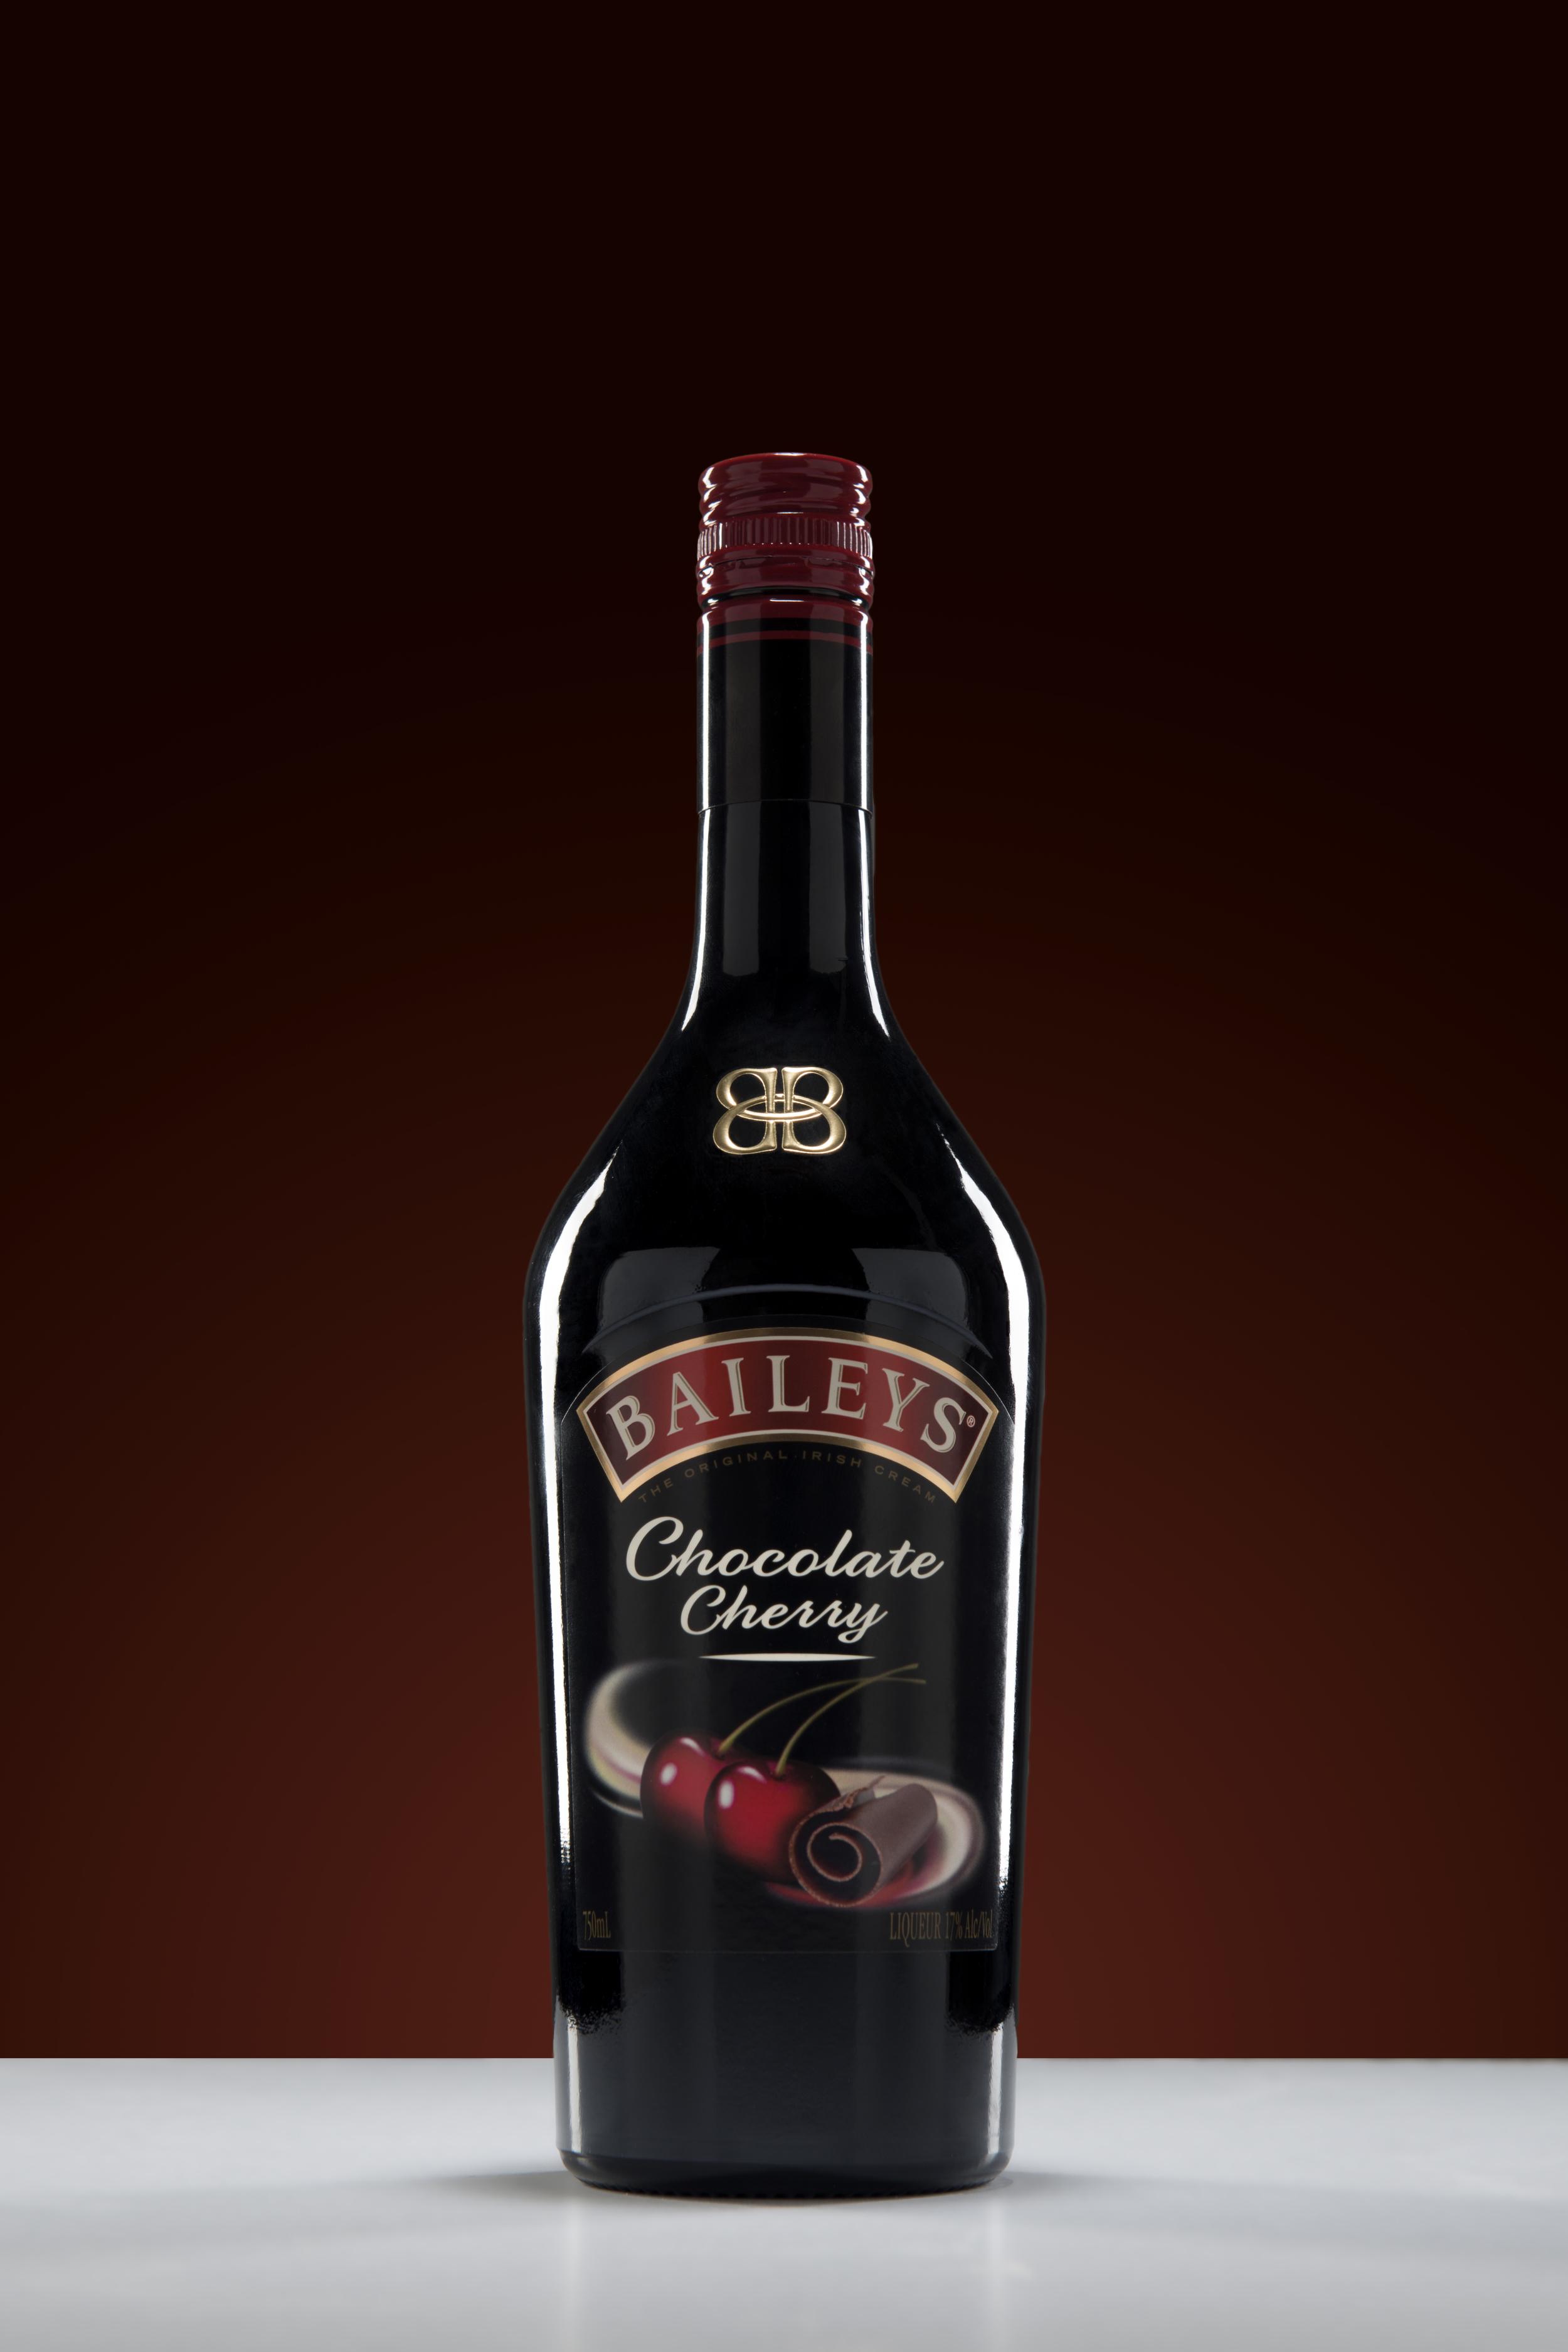 Baileys Chocolate Cherry Spec Shot